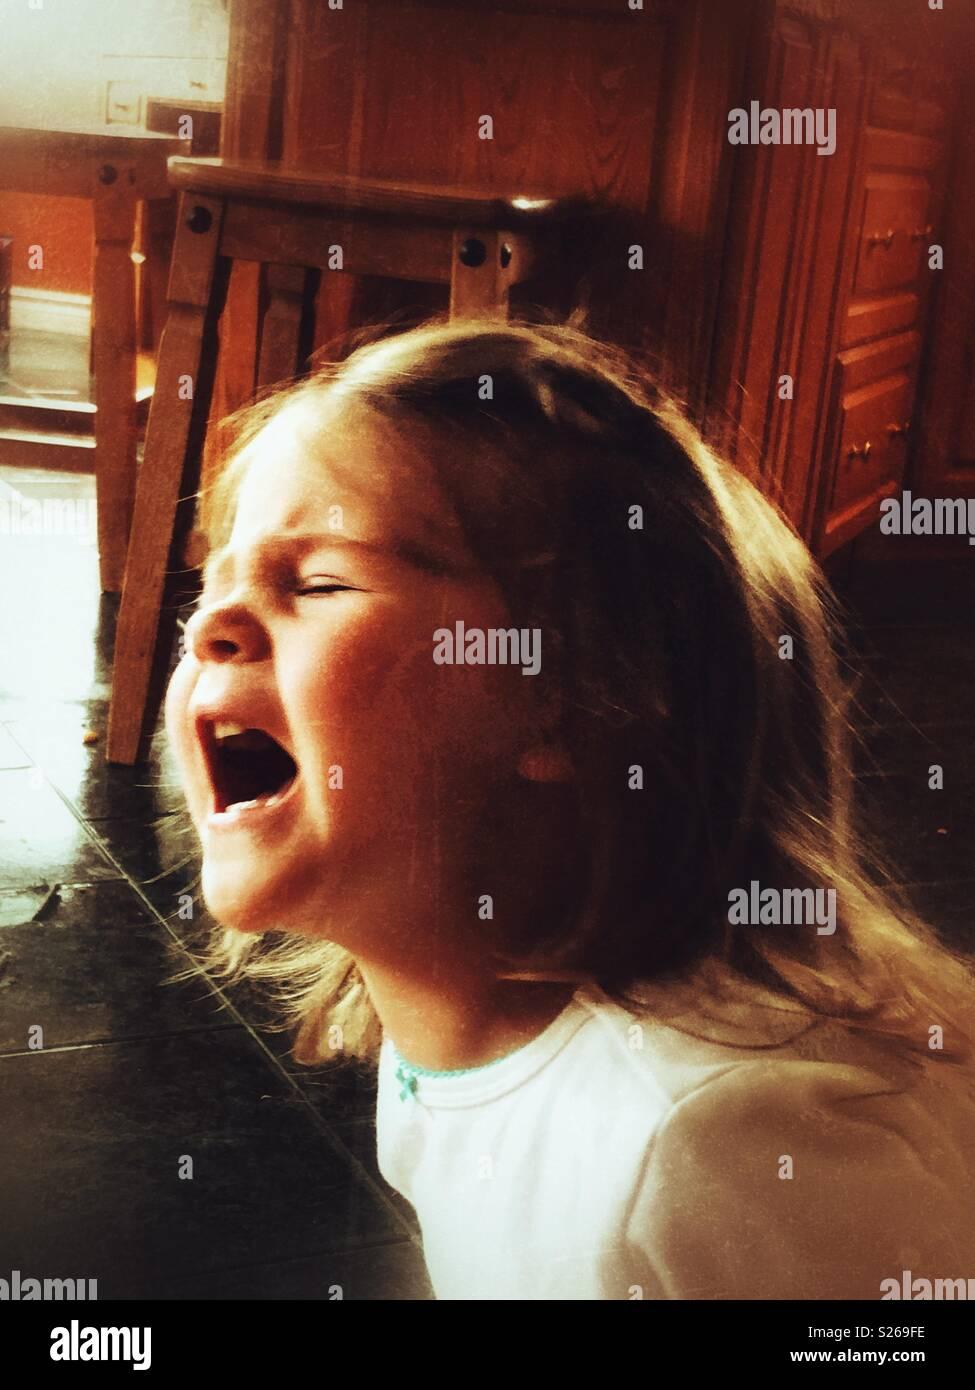 Toddler girl screaming during a temper tantrum Stock Photo